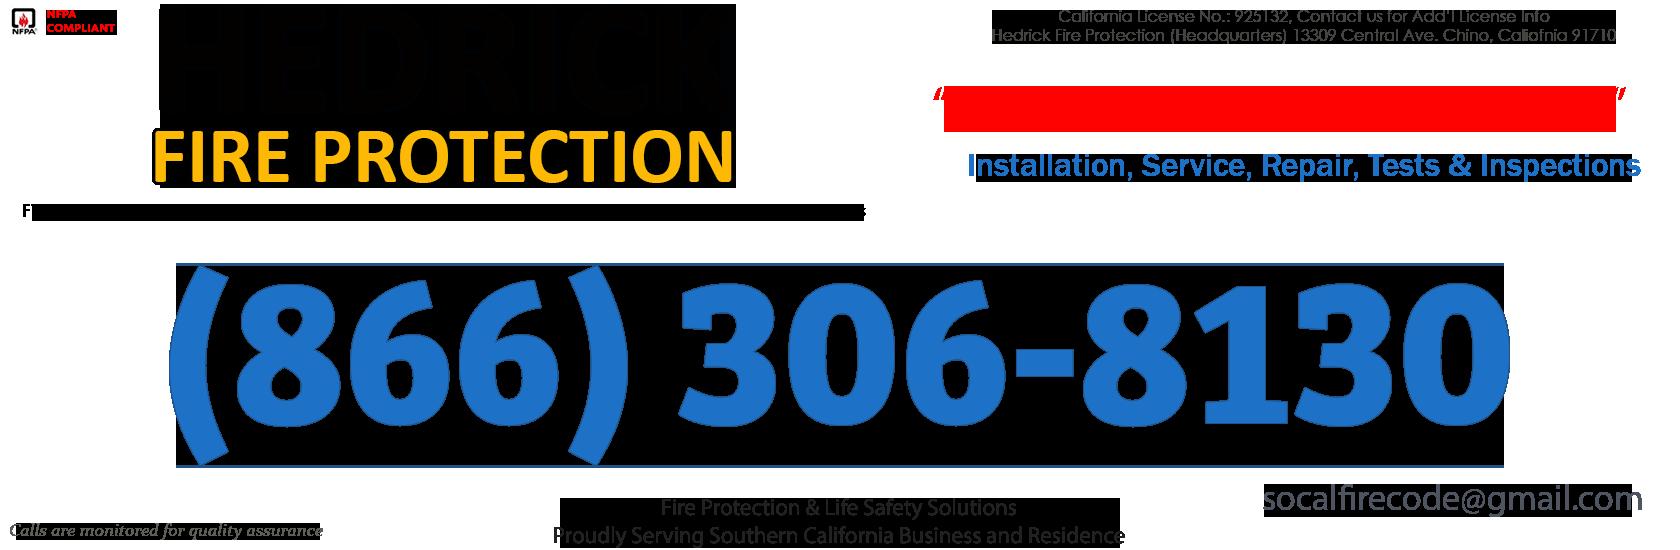 El Centro, California Fire Sprinkler Service Company